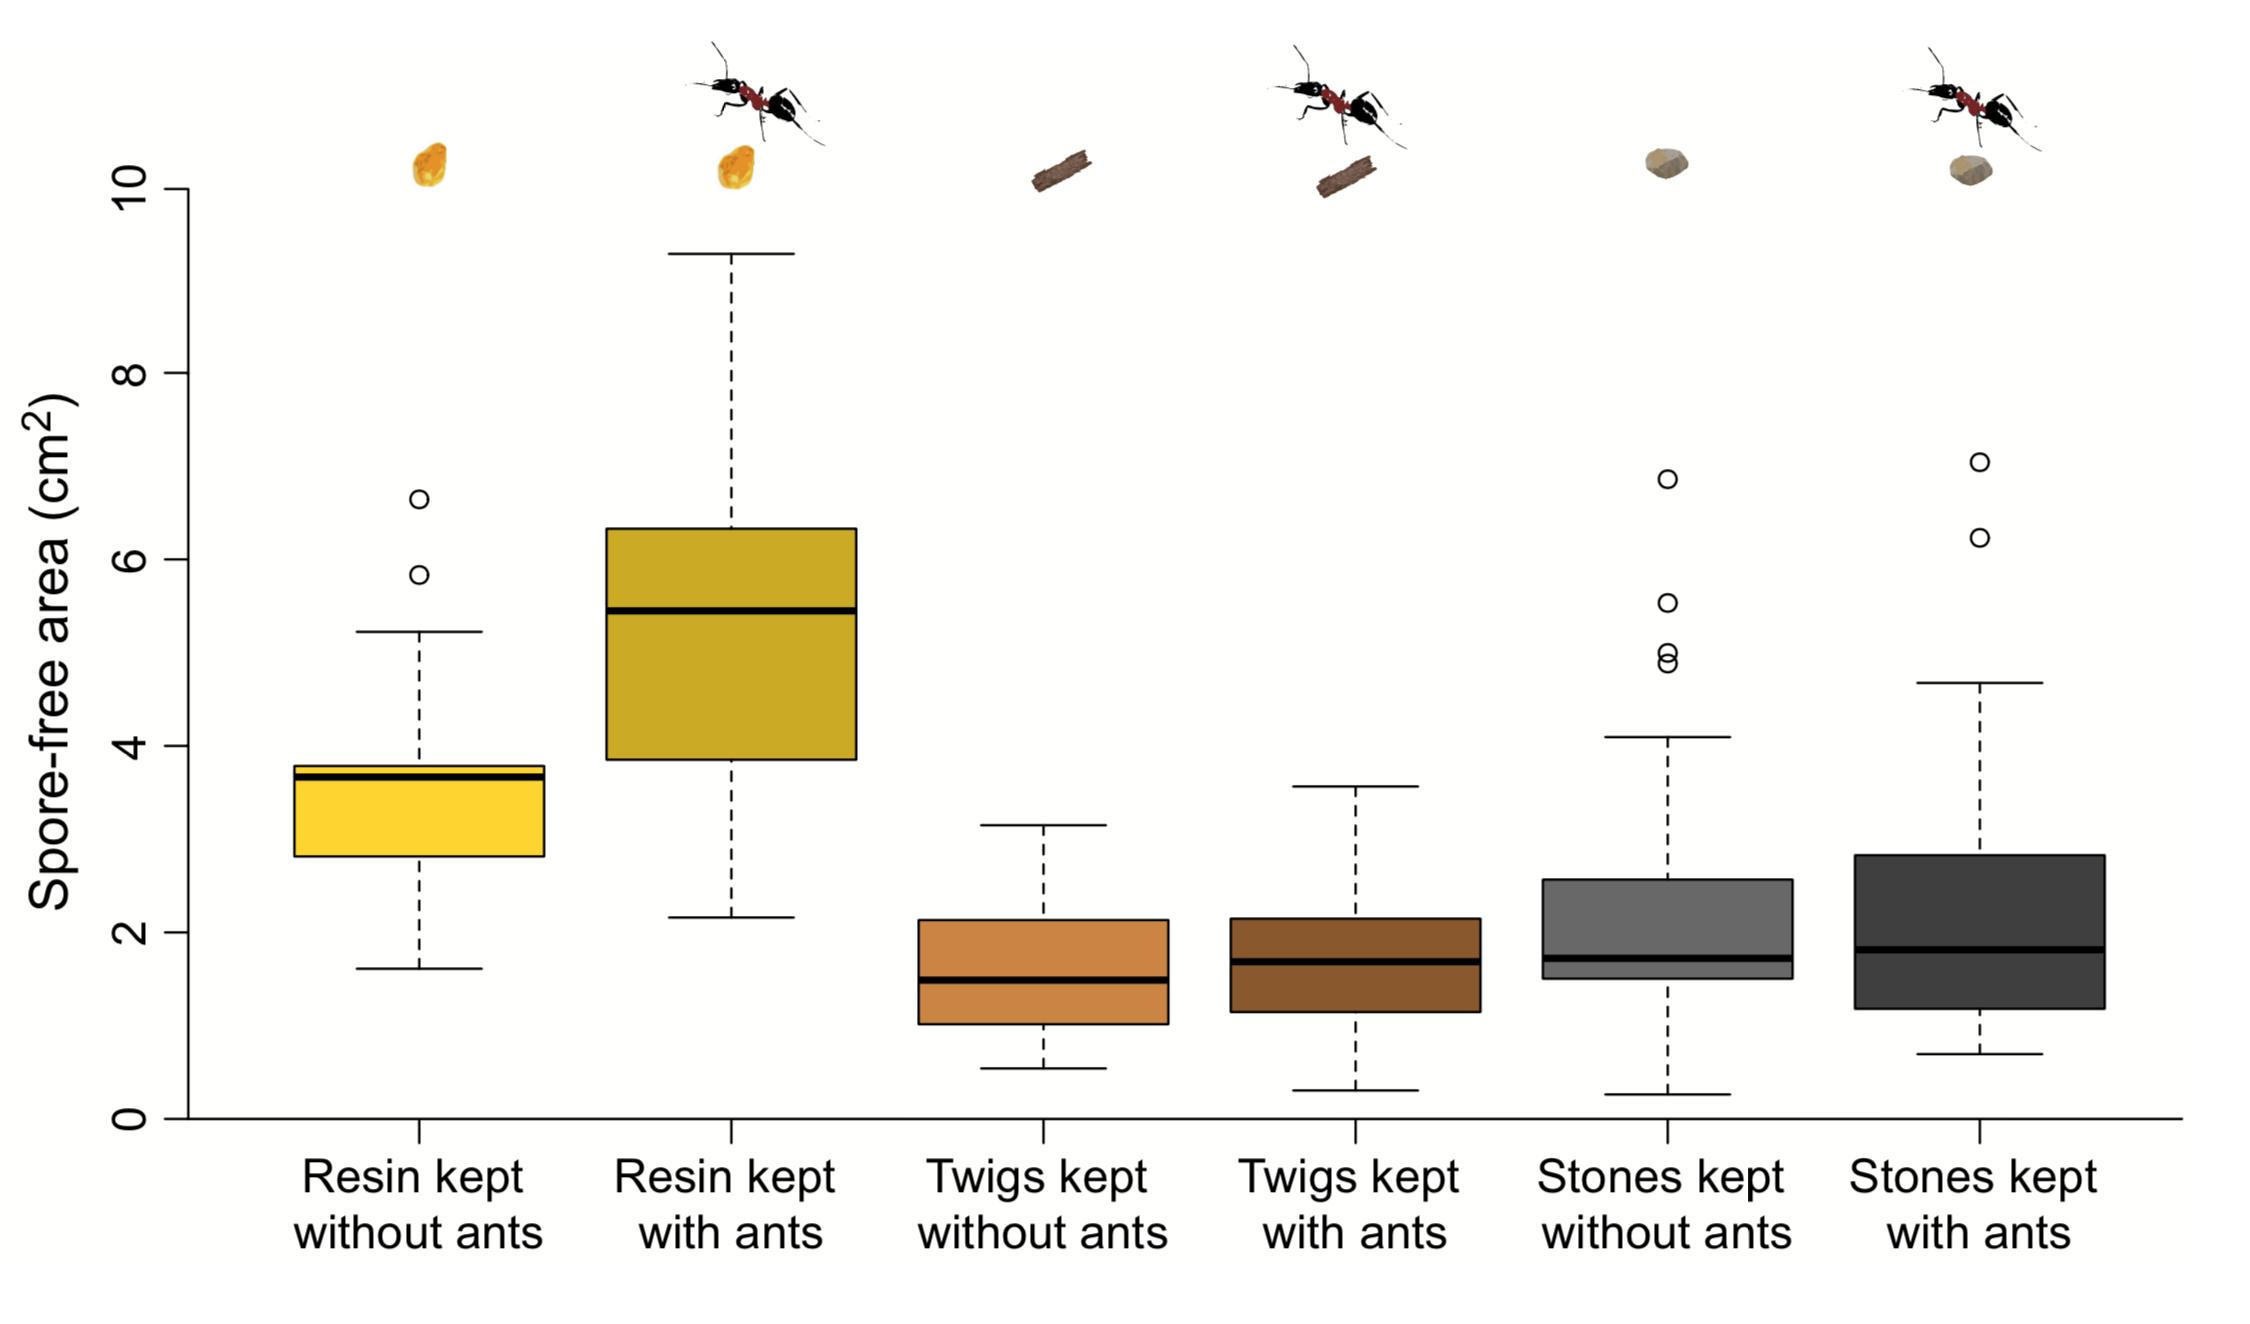 Fungal inhibition as a function of nest object and treatment. Timothée Brütsch  et al. 2017 .